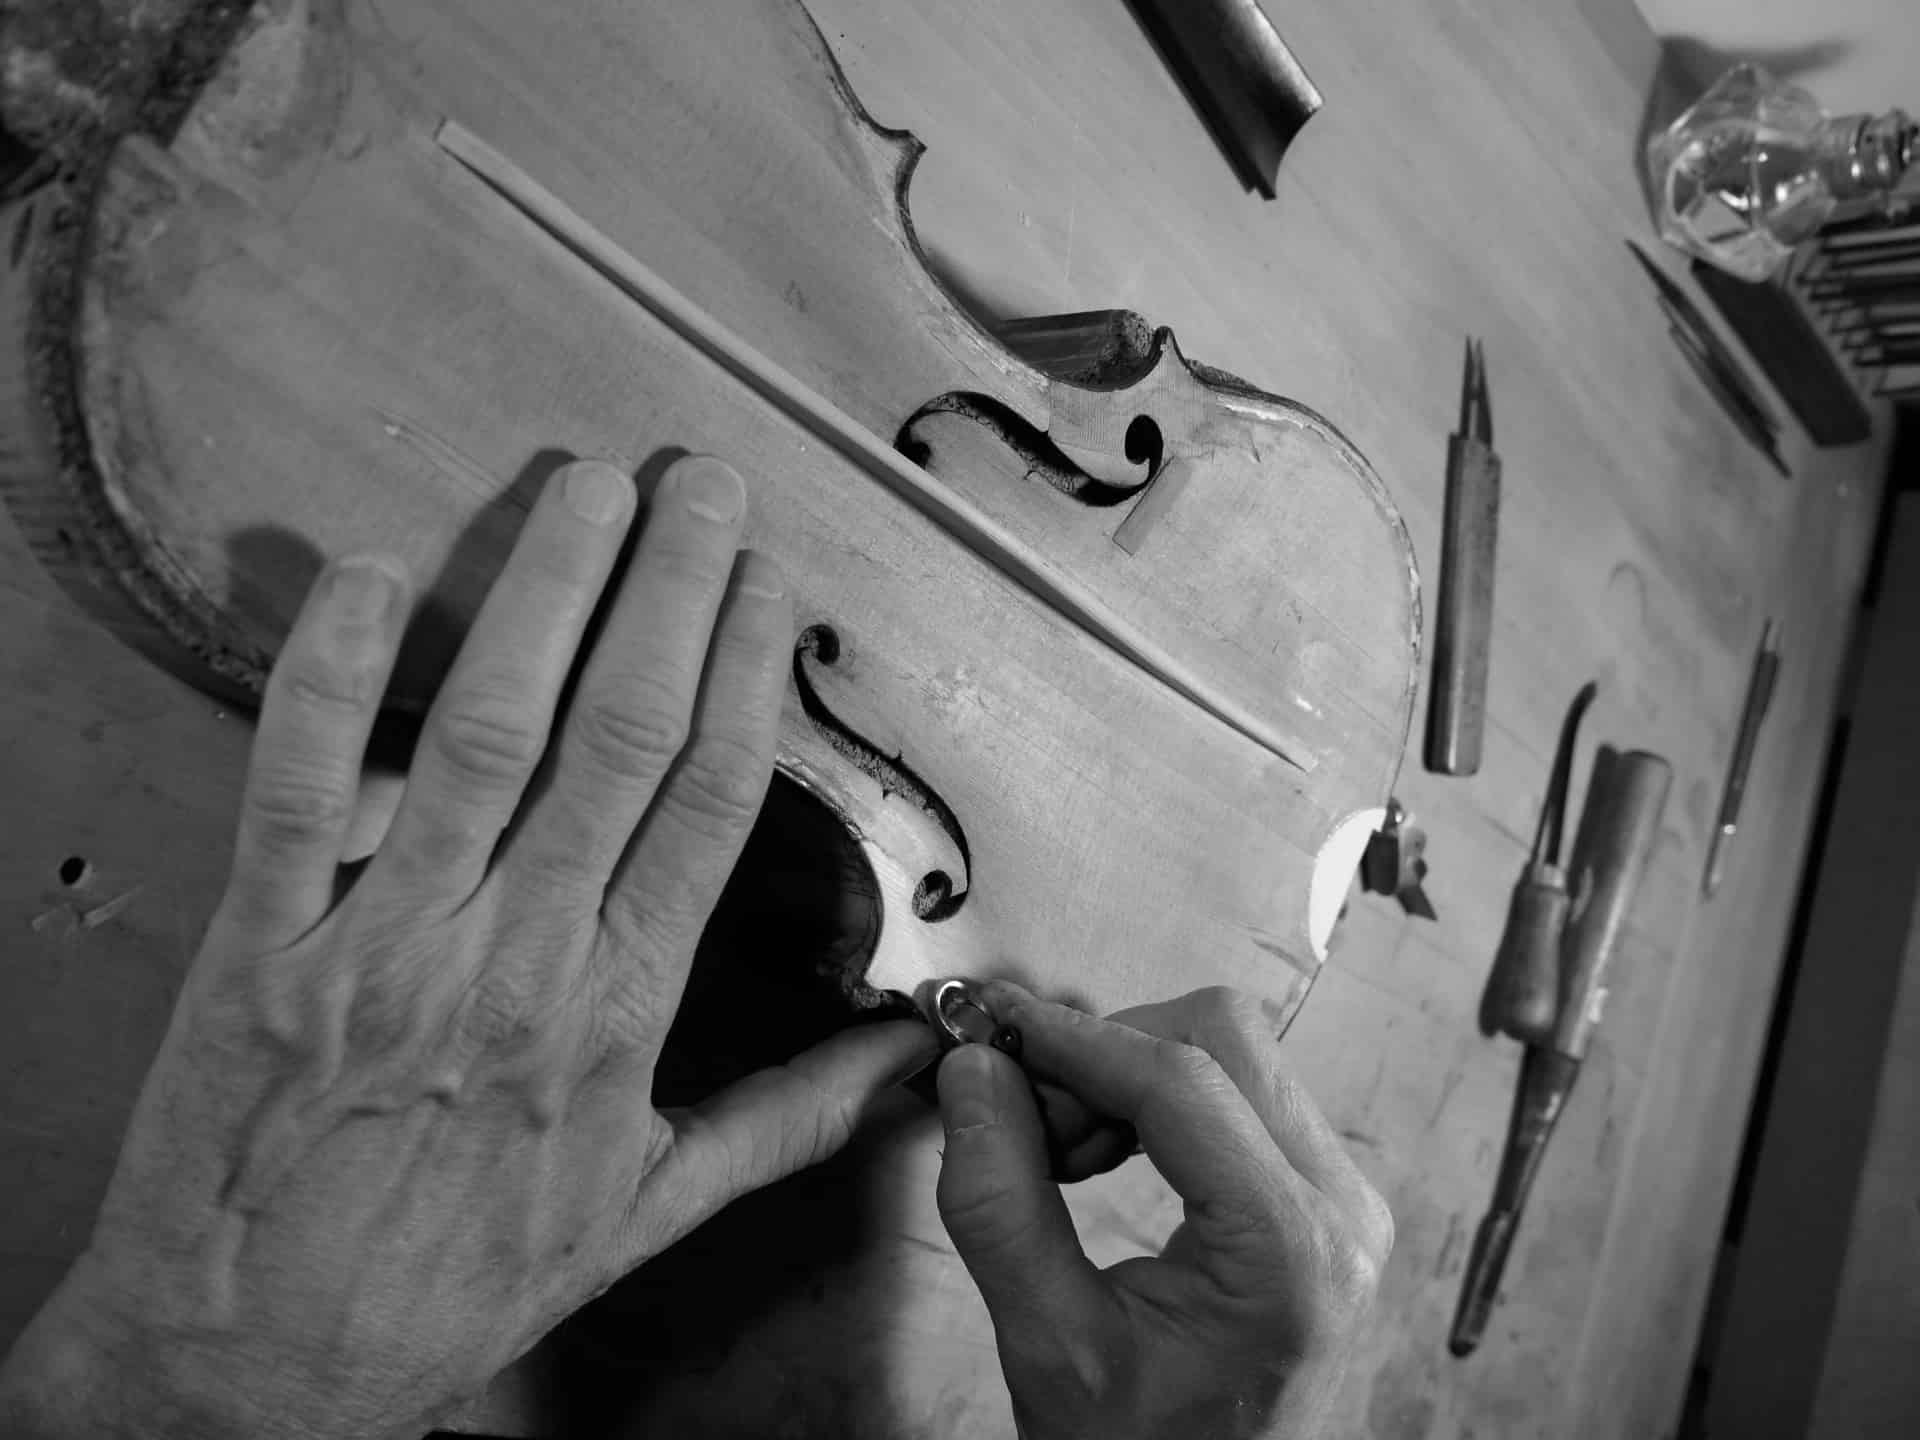 Working hard on a violin - New York